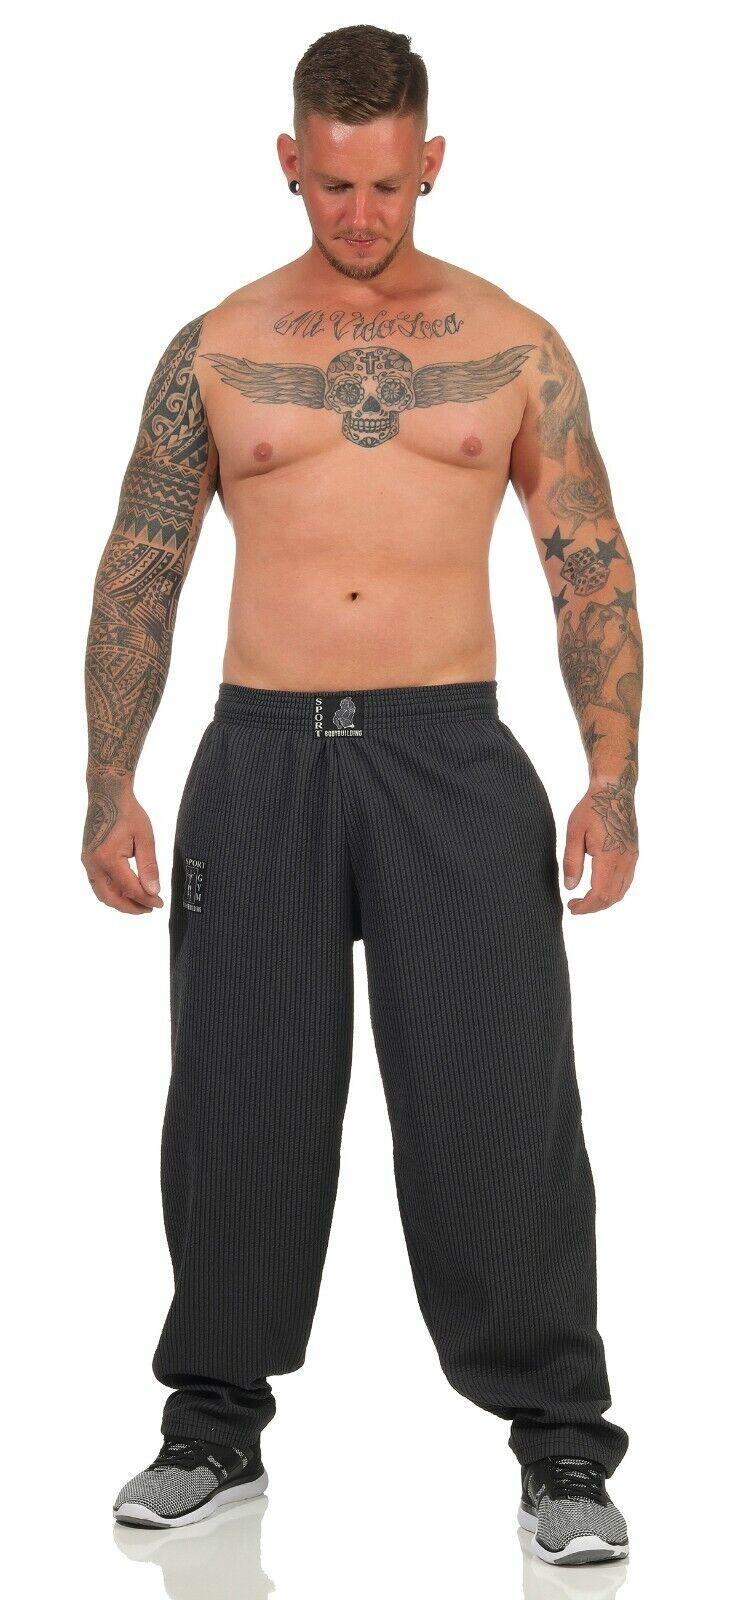 Bodybuildinghose Totenkopf Jogginghose Pitbull Sporthose Pumperhose Gr.M-12XL